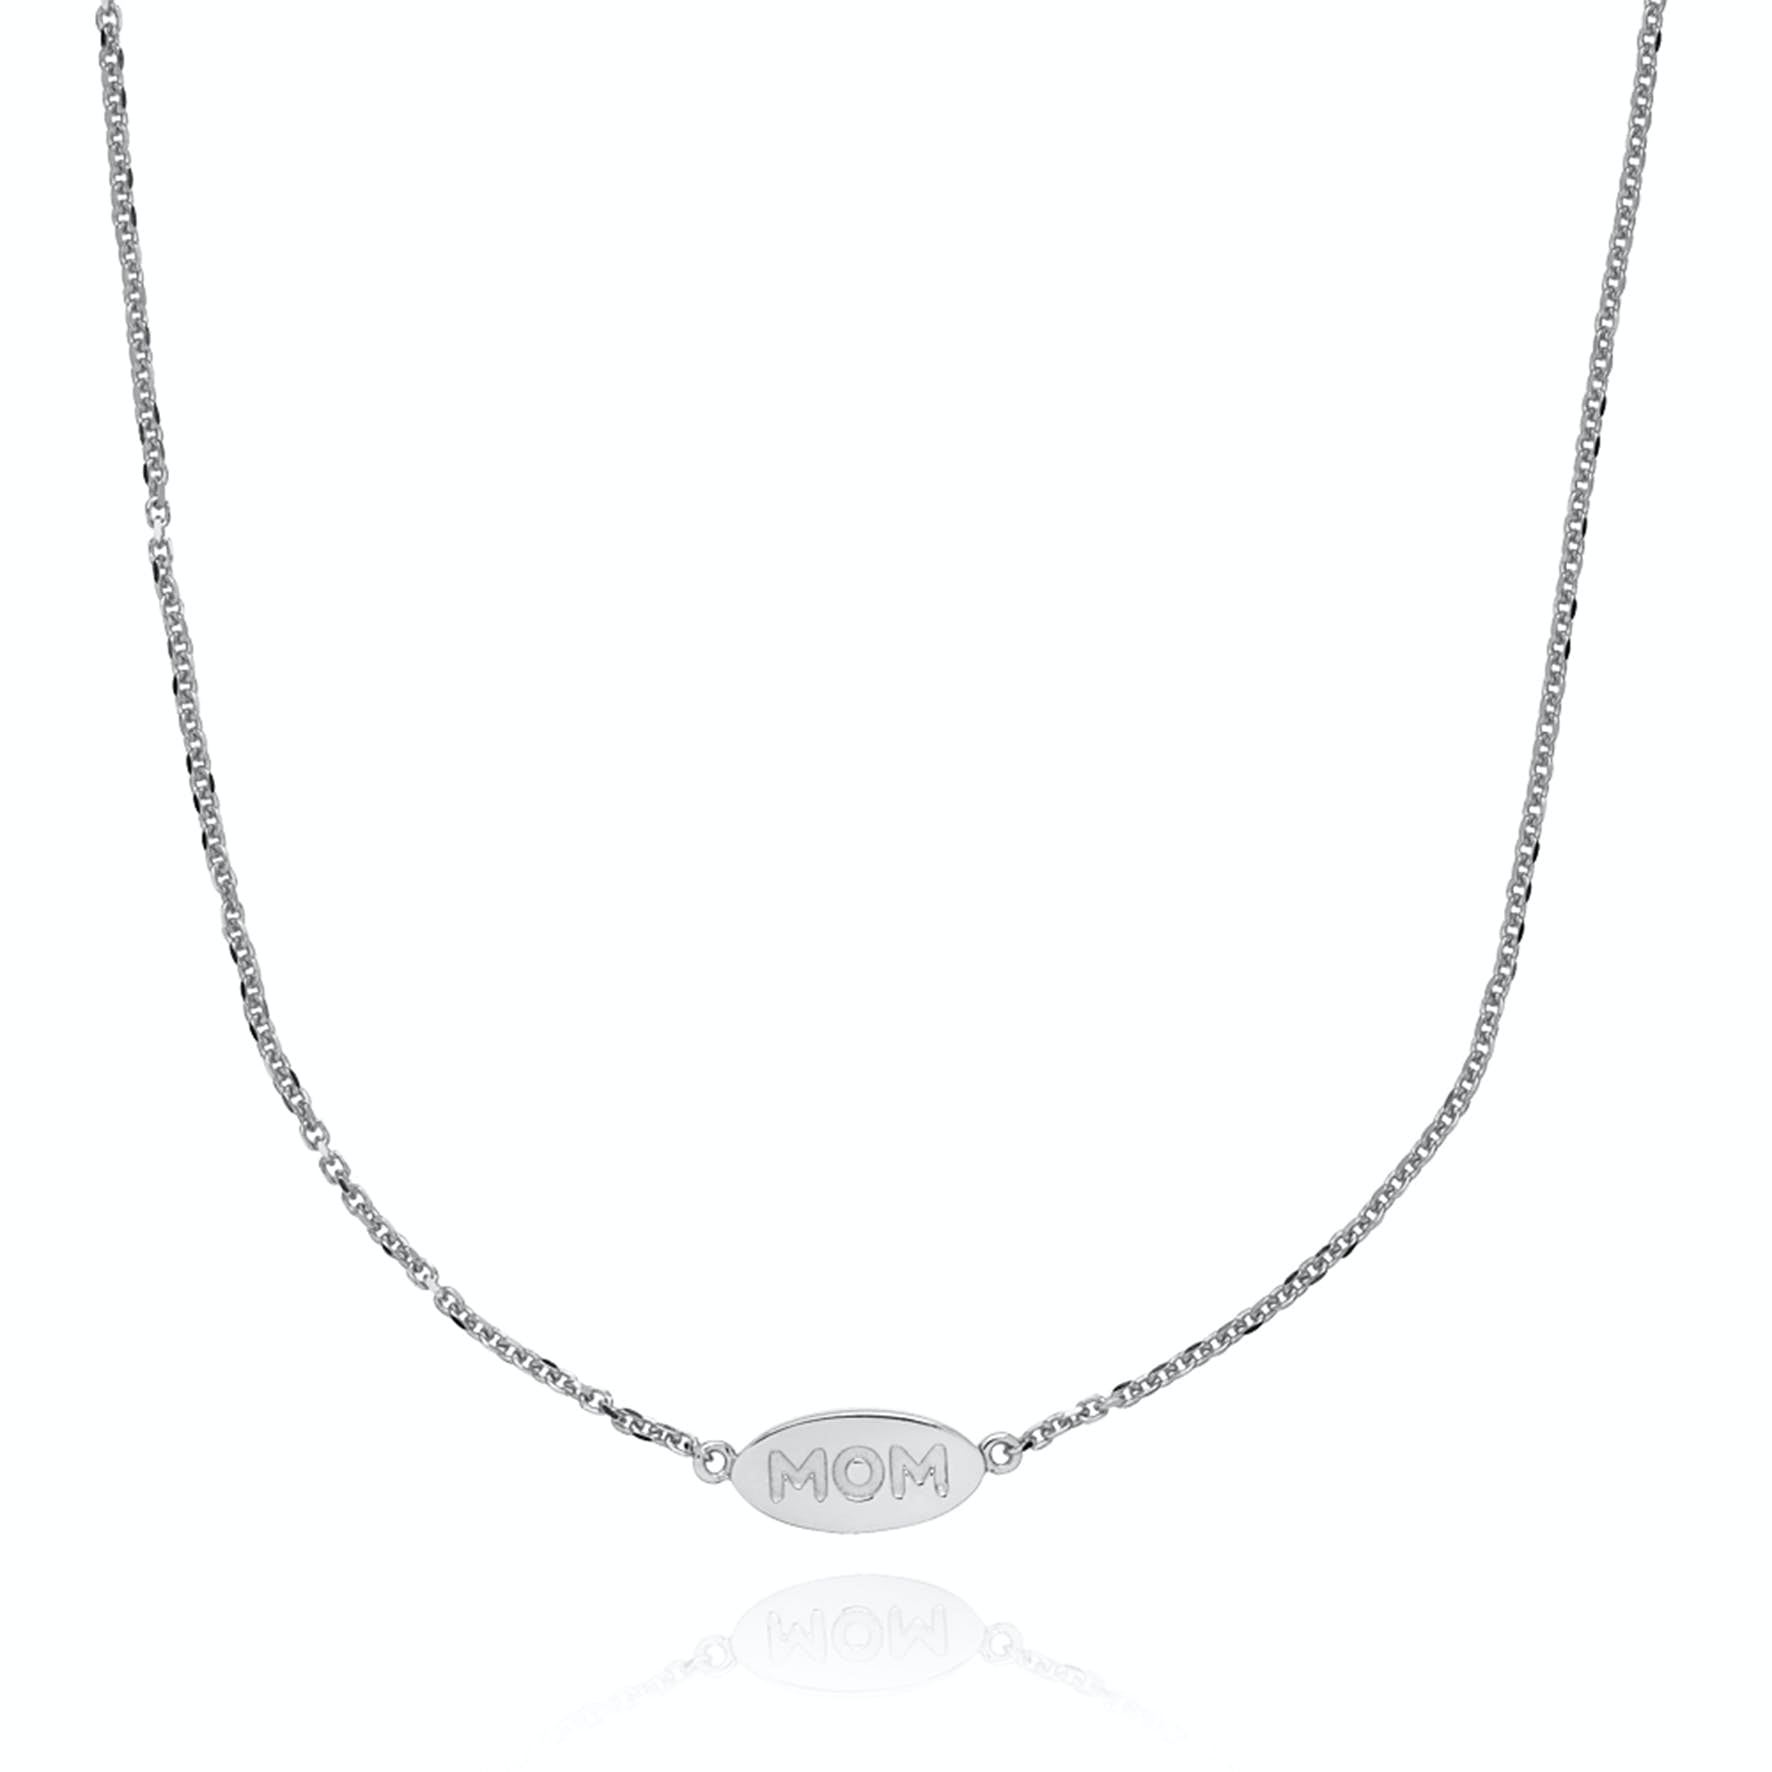 Fam Mom Necklace fra Sistie i Sølv Sterling 925